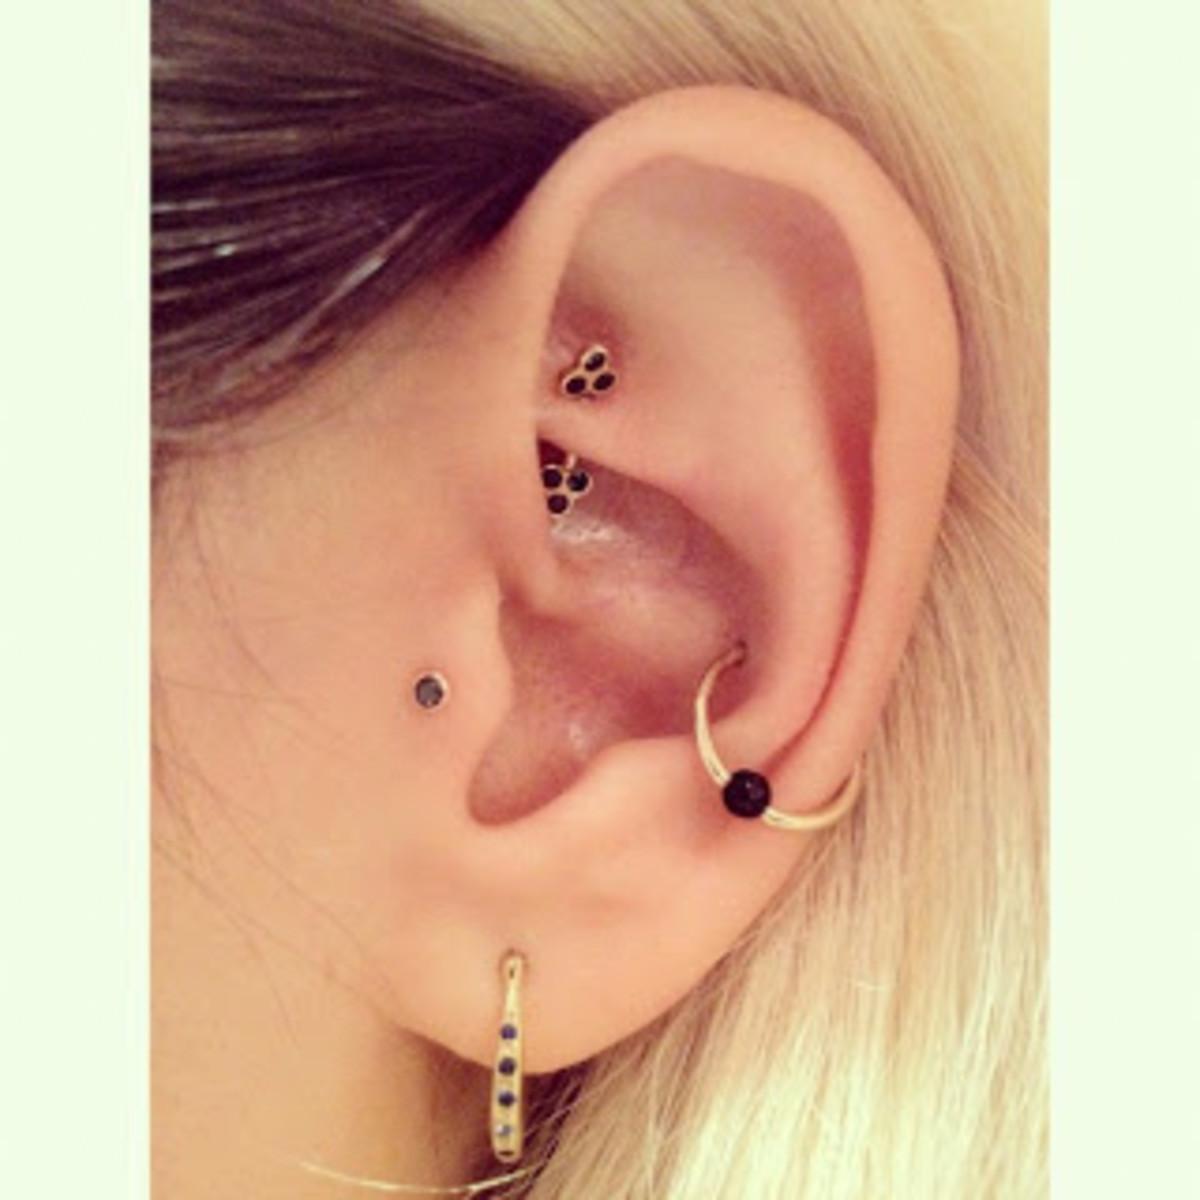 Rook, tragus, orbital, and lobe piercings